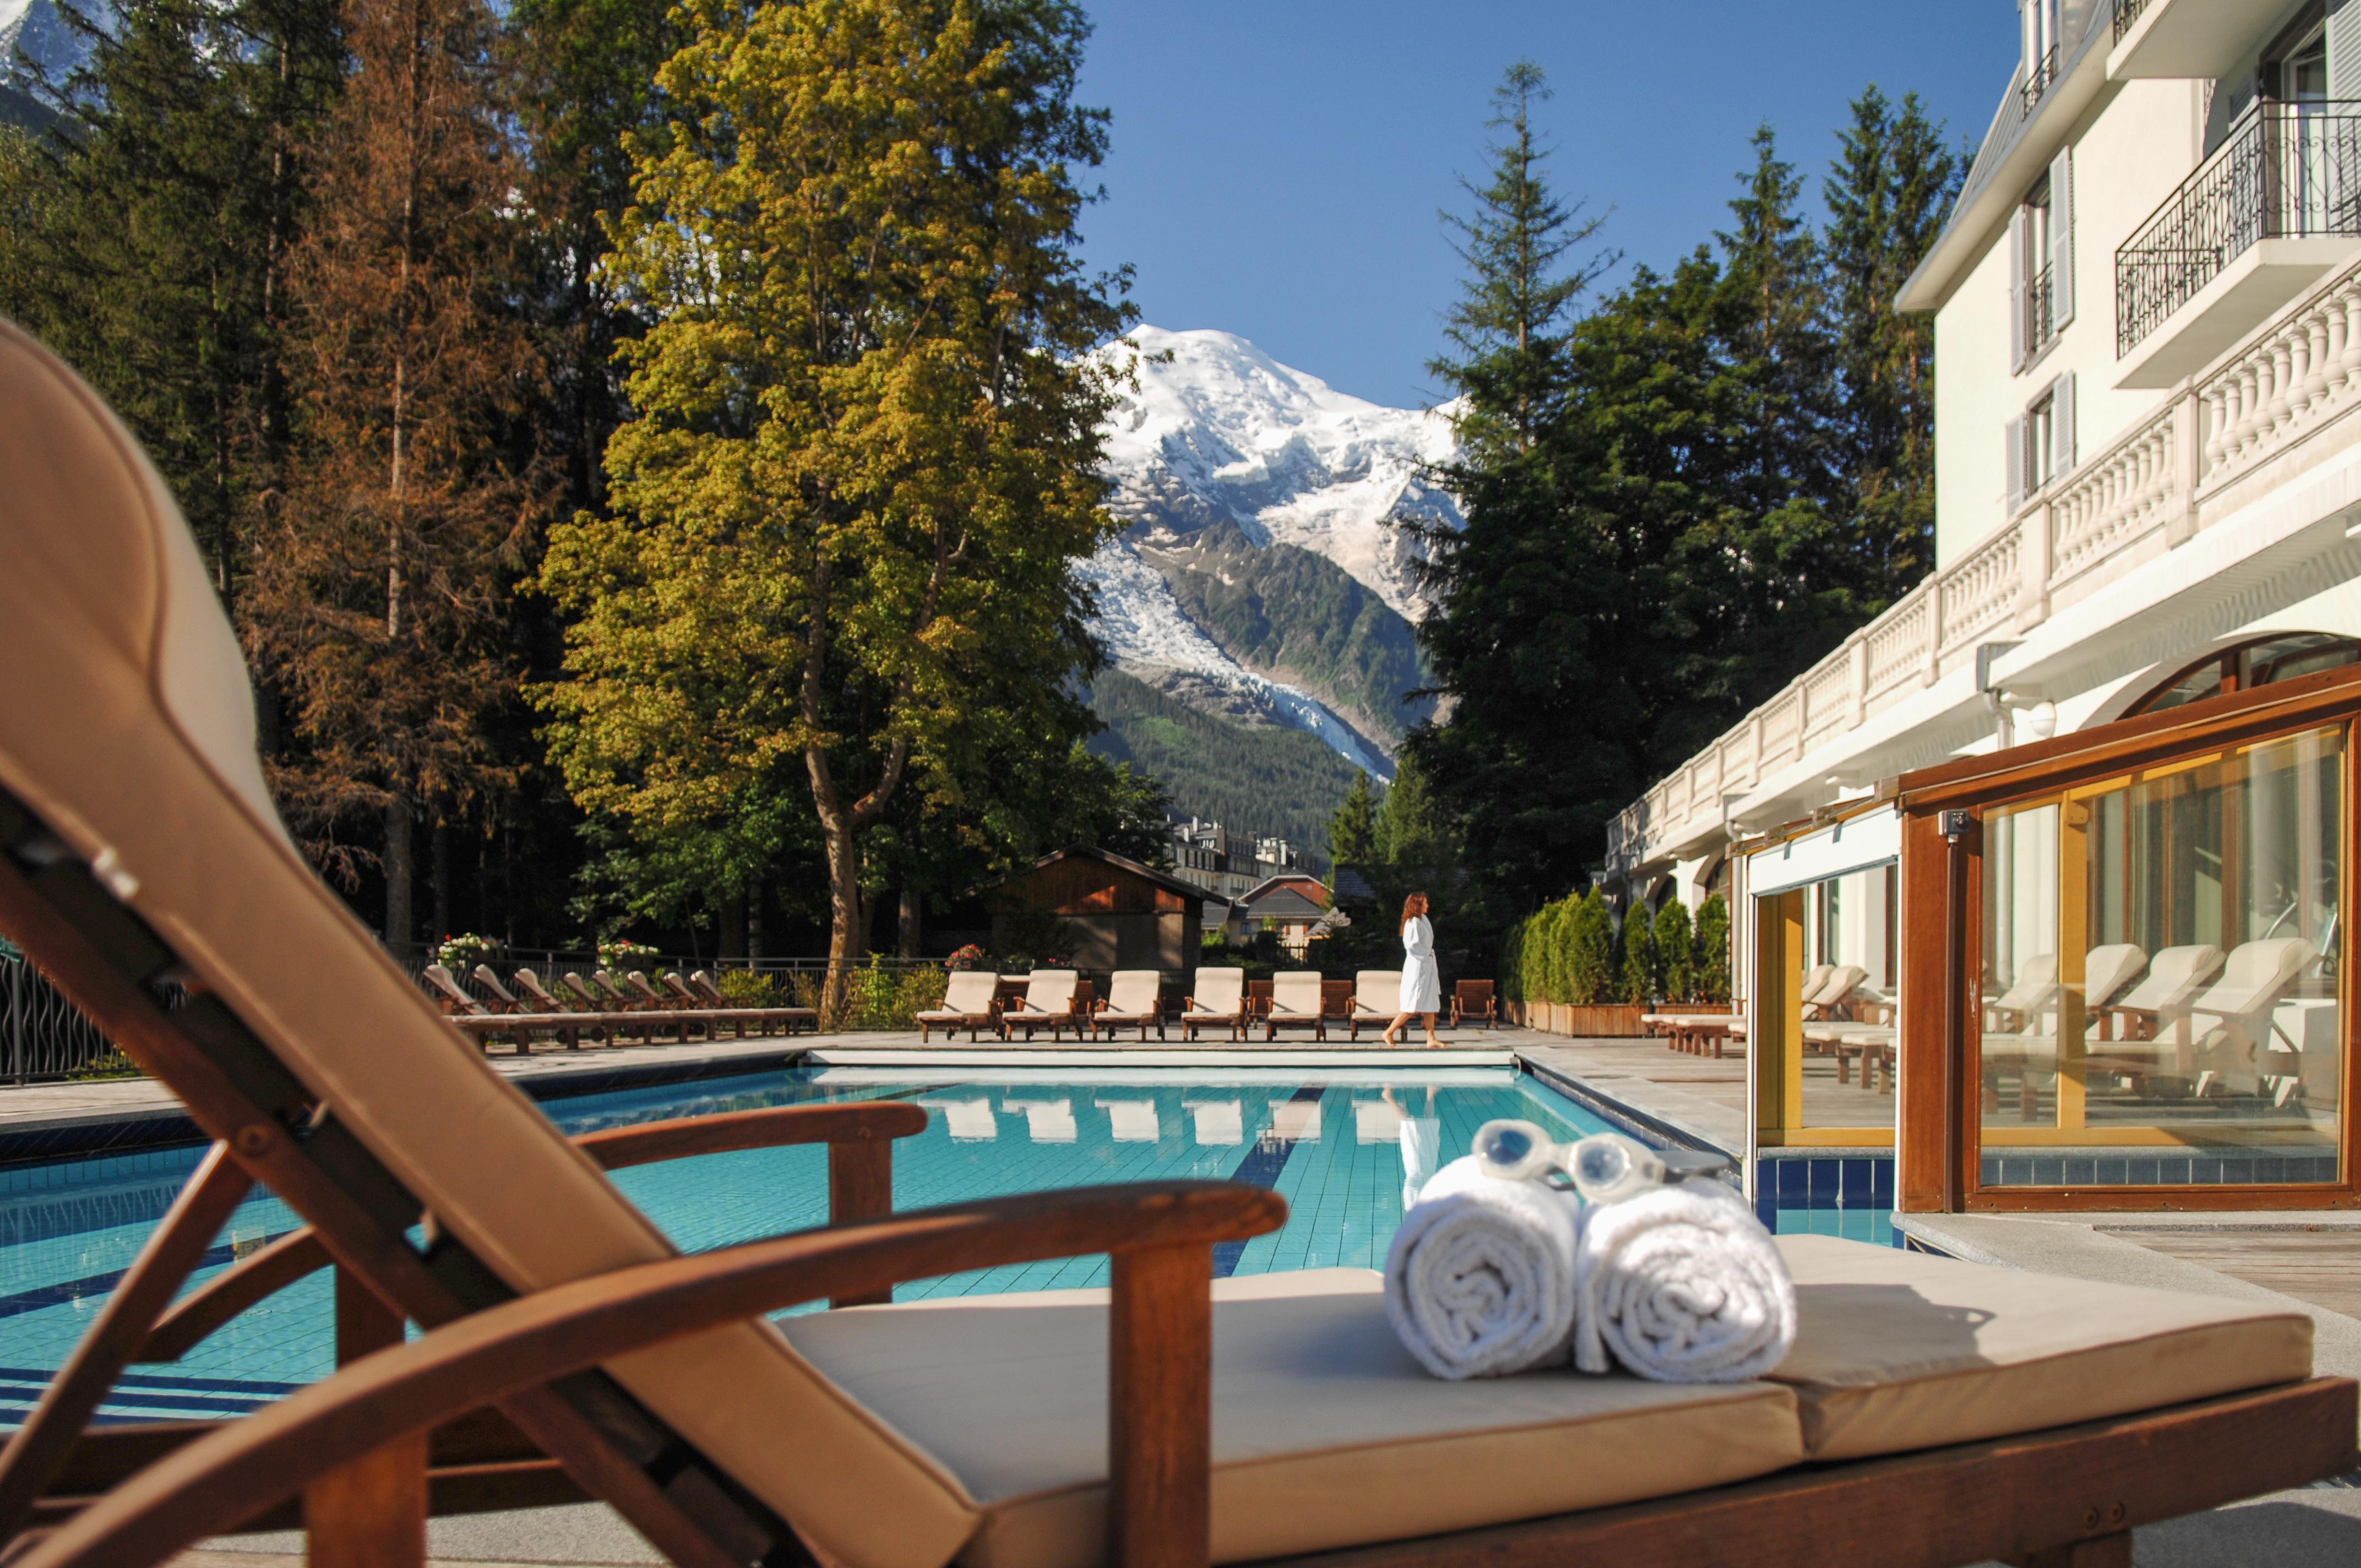 La Folie Douce Hotels Chamonix